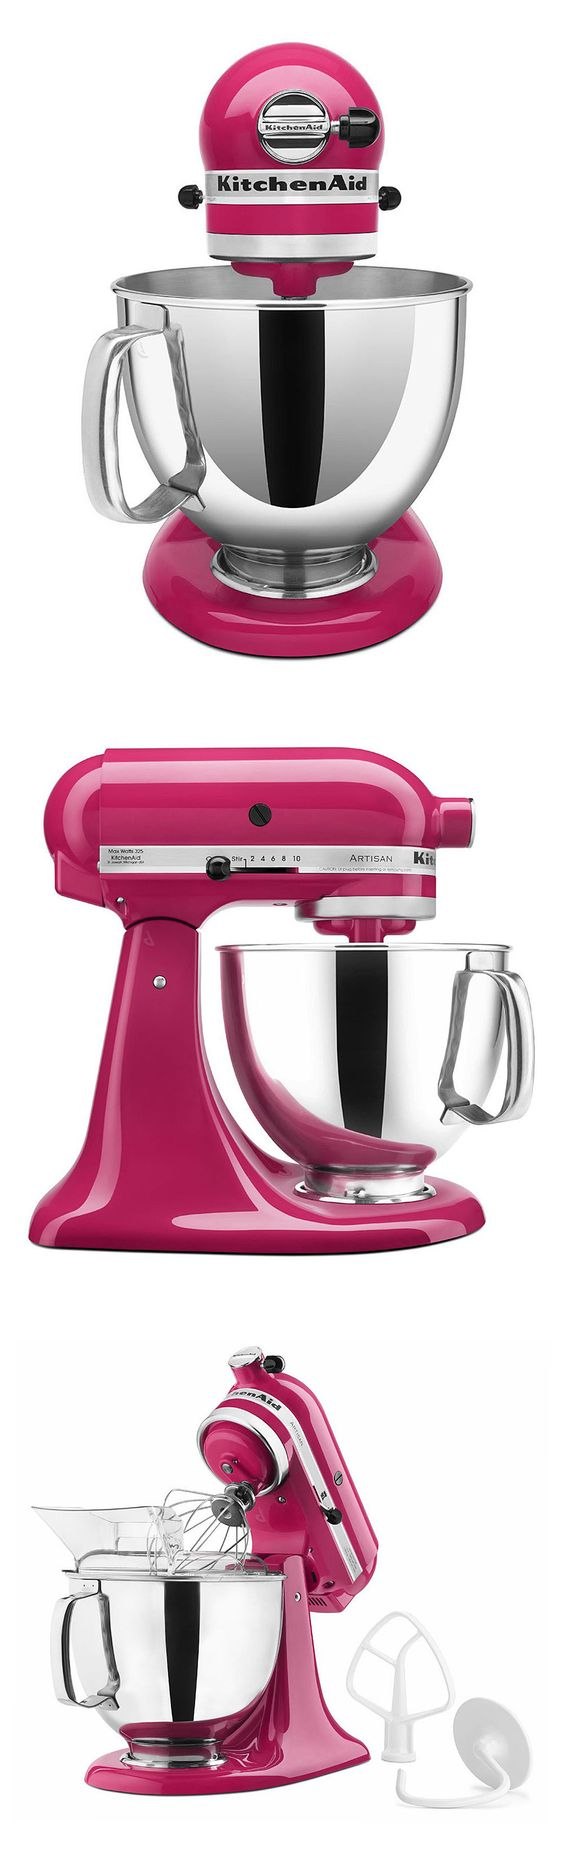 Pinterest the world s catalog of ideas - Flamingo pink kitchenaid mixer ...